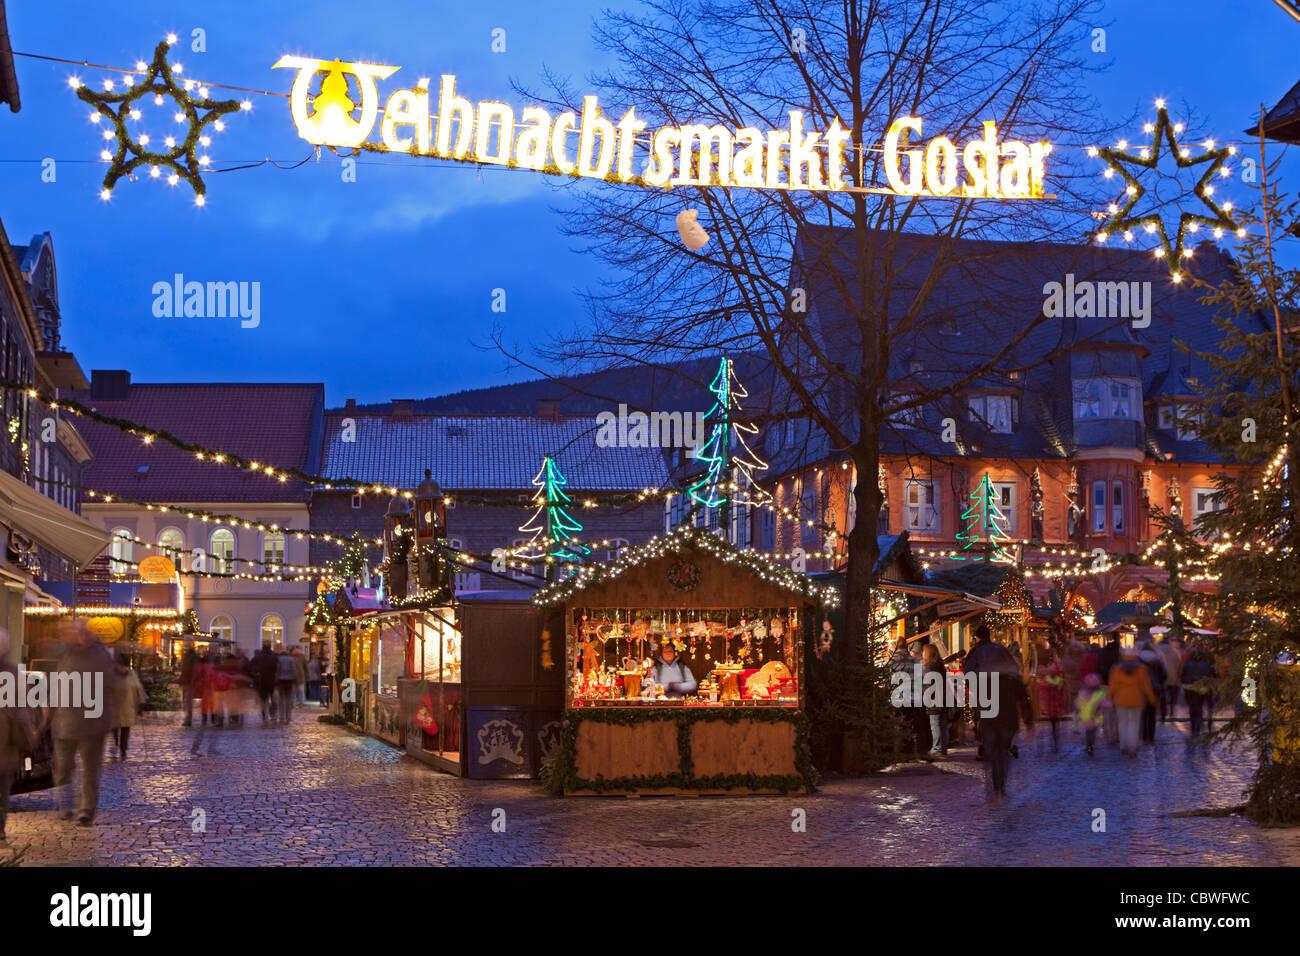 Goslar Christmas Market 2021 Christmas Market At The Market Square Of Goslar Harz Mountains Lower Saxony Germany Stock Photo Alamy